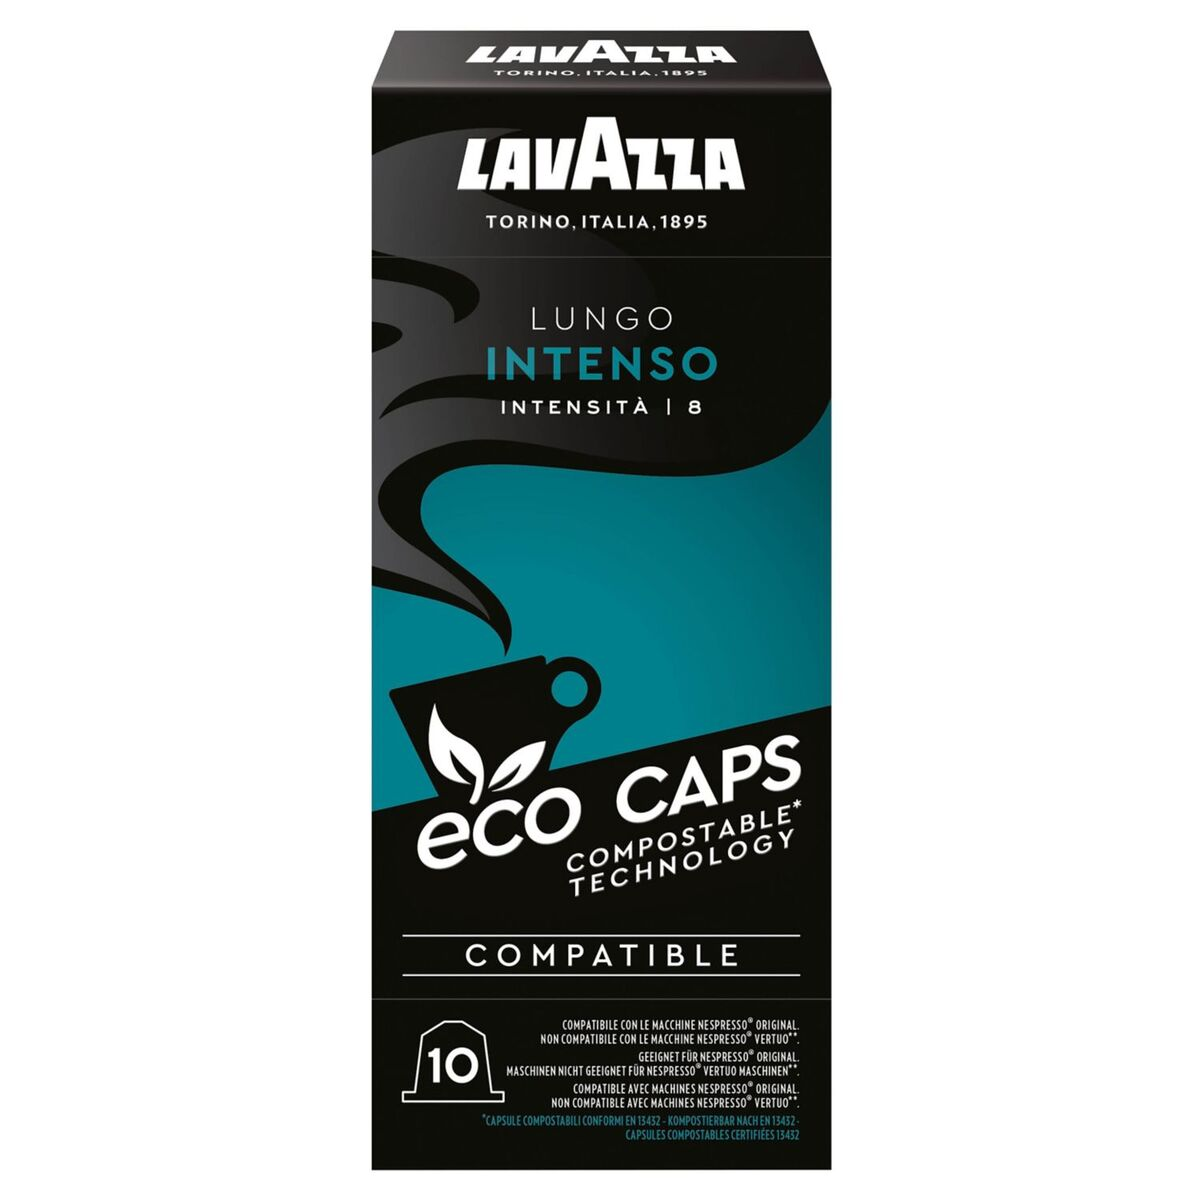 Bild 3 von LAVAZZA Eco Caps 53 g